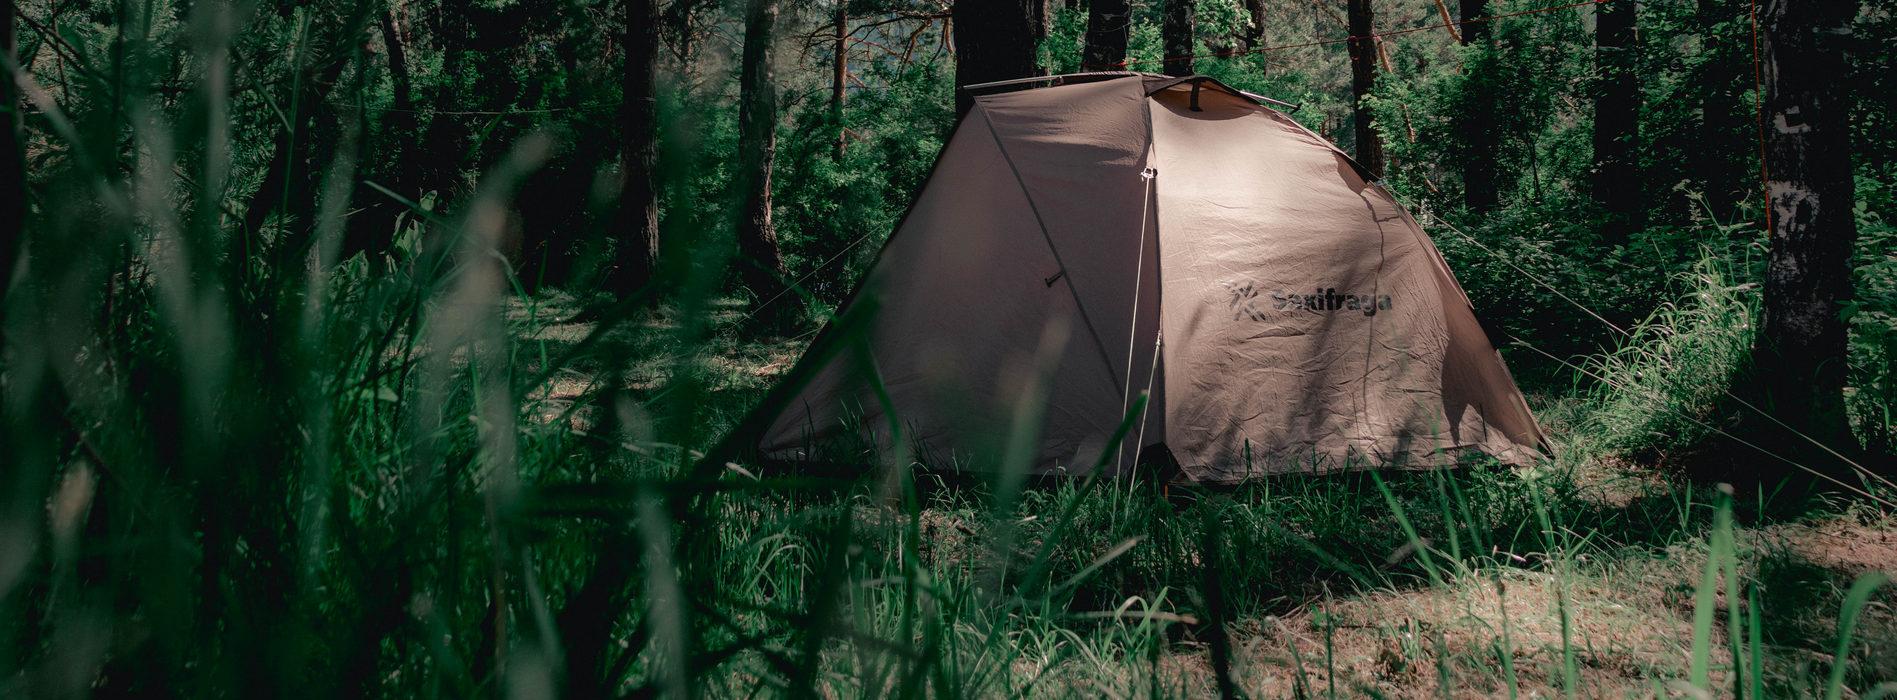 палатки алтай